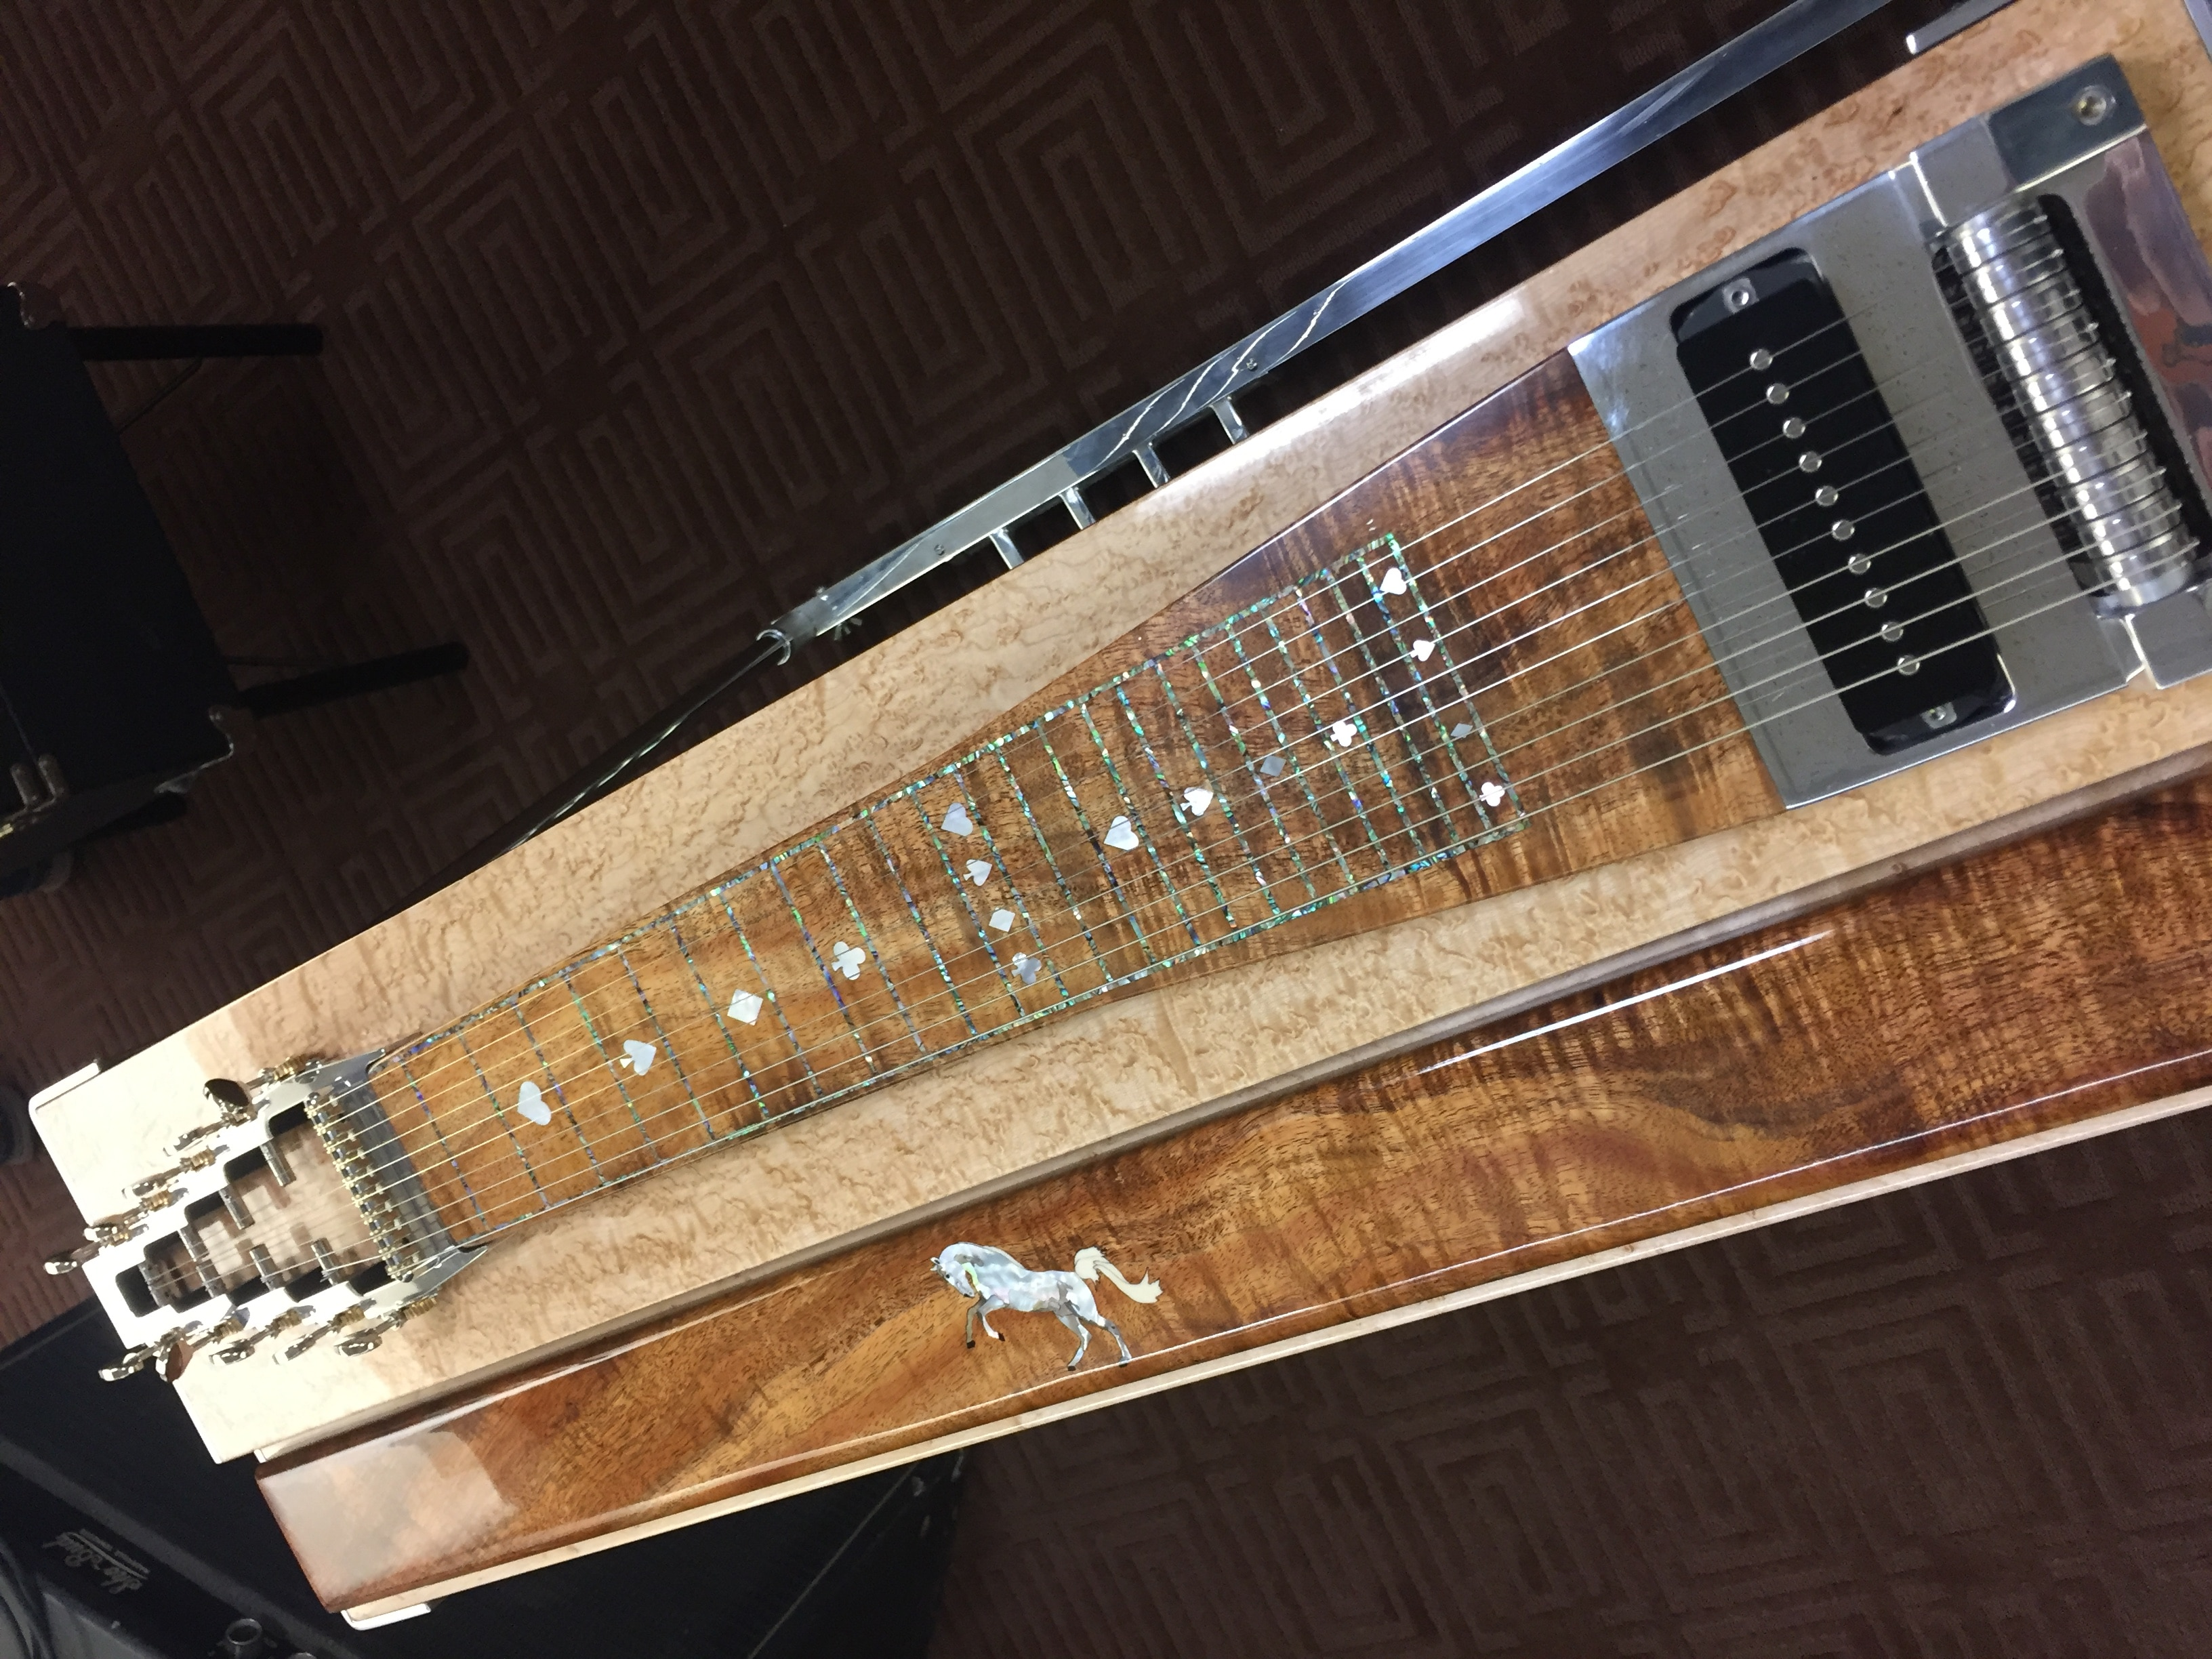 e9 pedal steel guitar pro v signature series jackson steel guitar. Black Bedroom Furniture Sets. Home Design Ideas